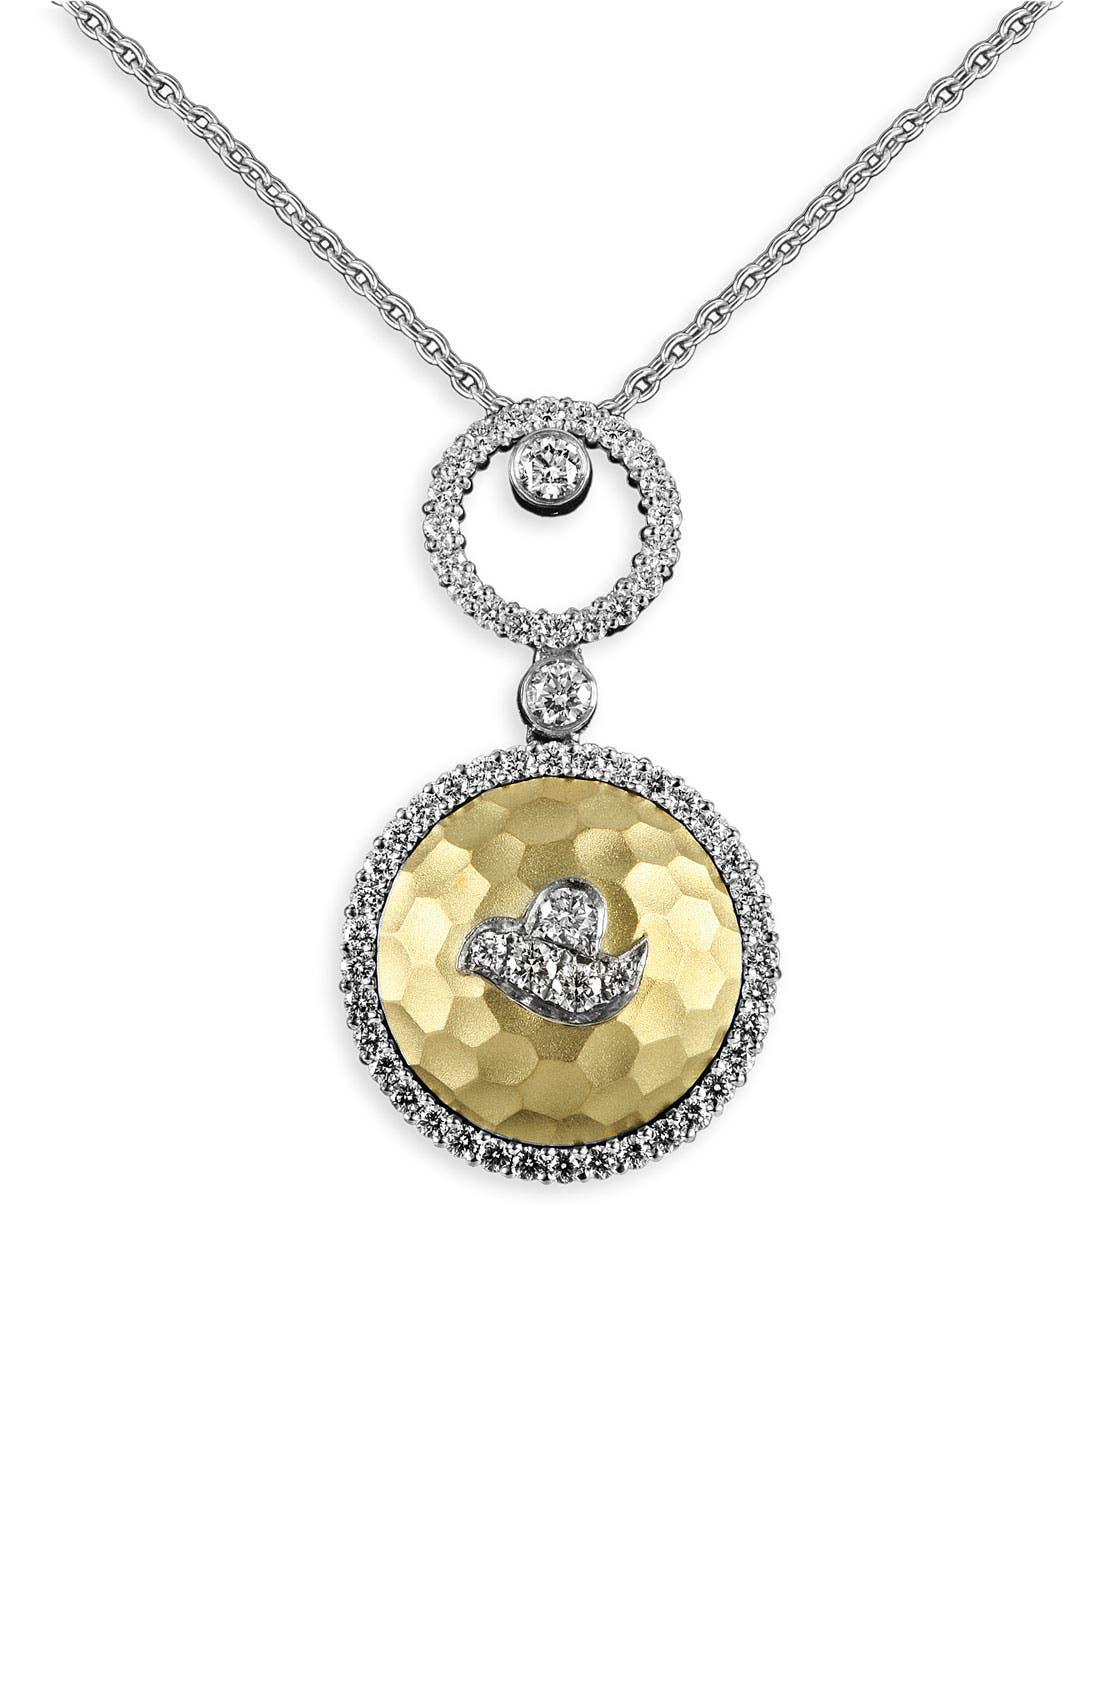 Alternate Image 1 Selected - Jack Kelége 'Byzantine' Double Drop Diamond Pendant Necklace